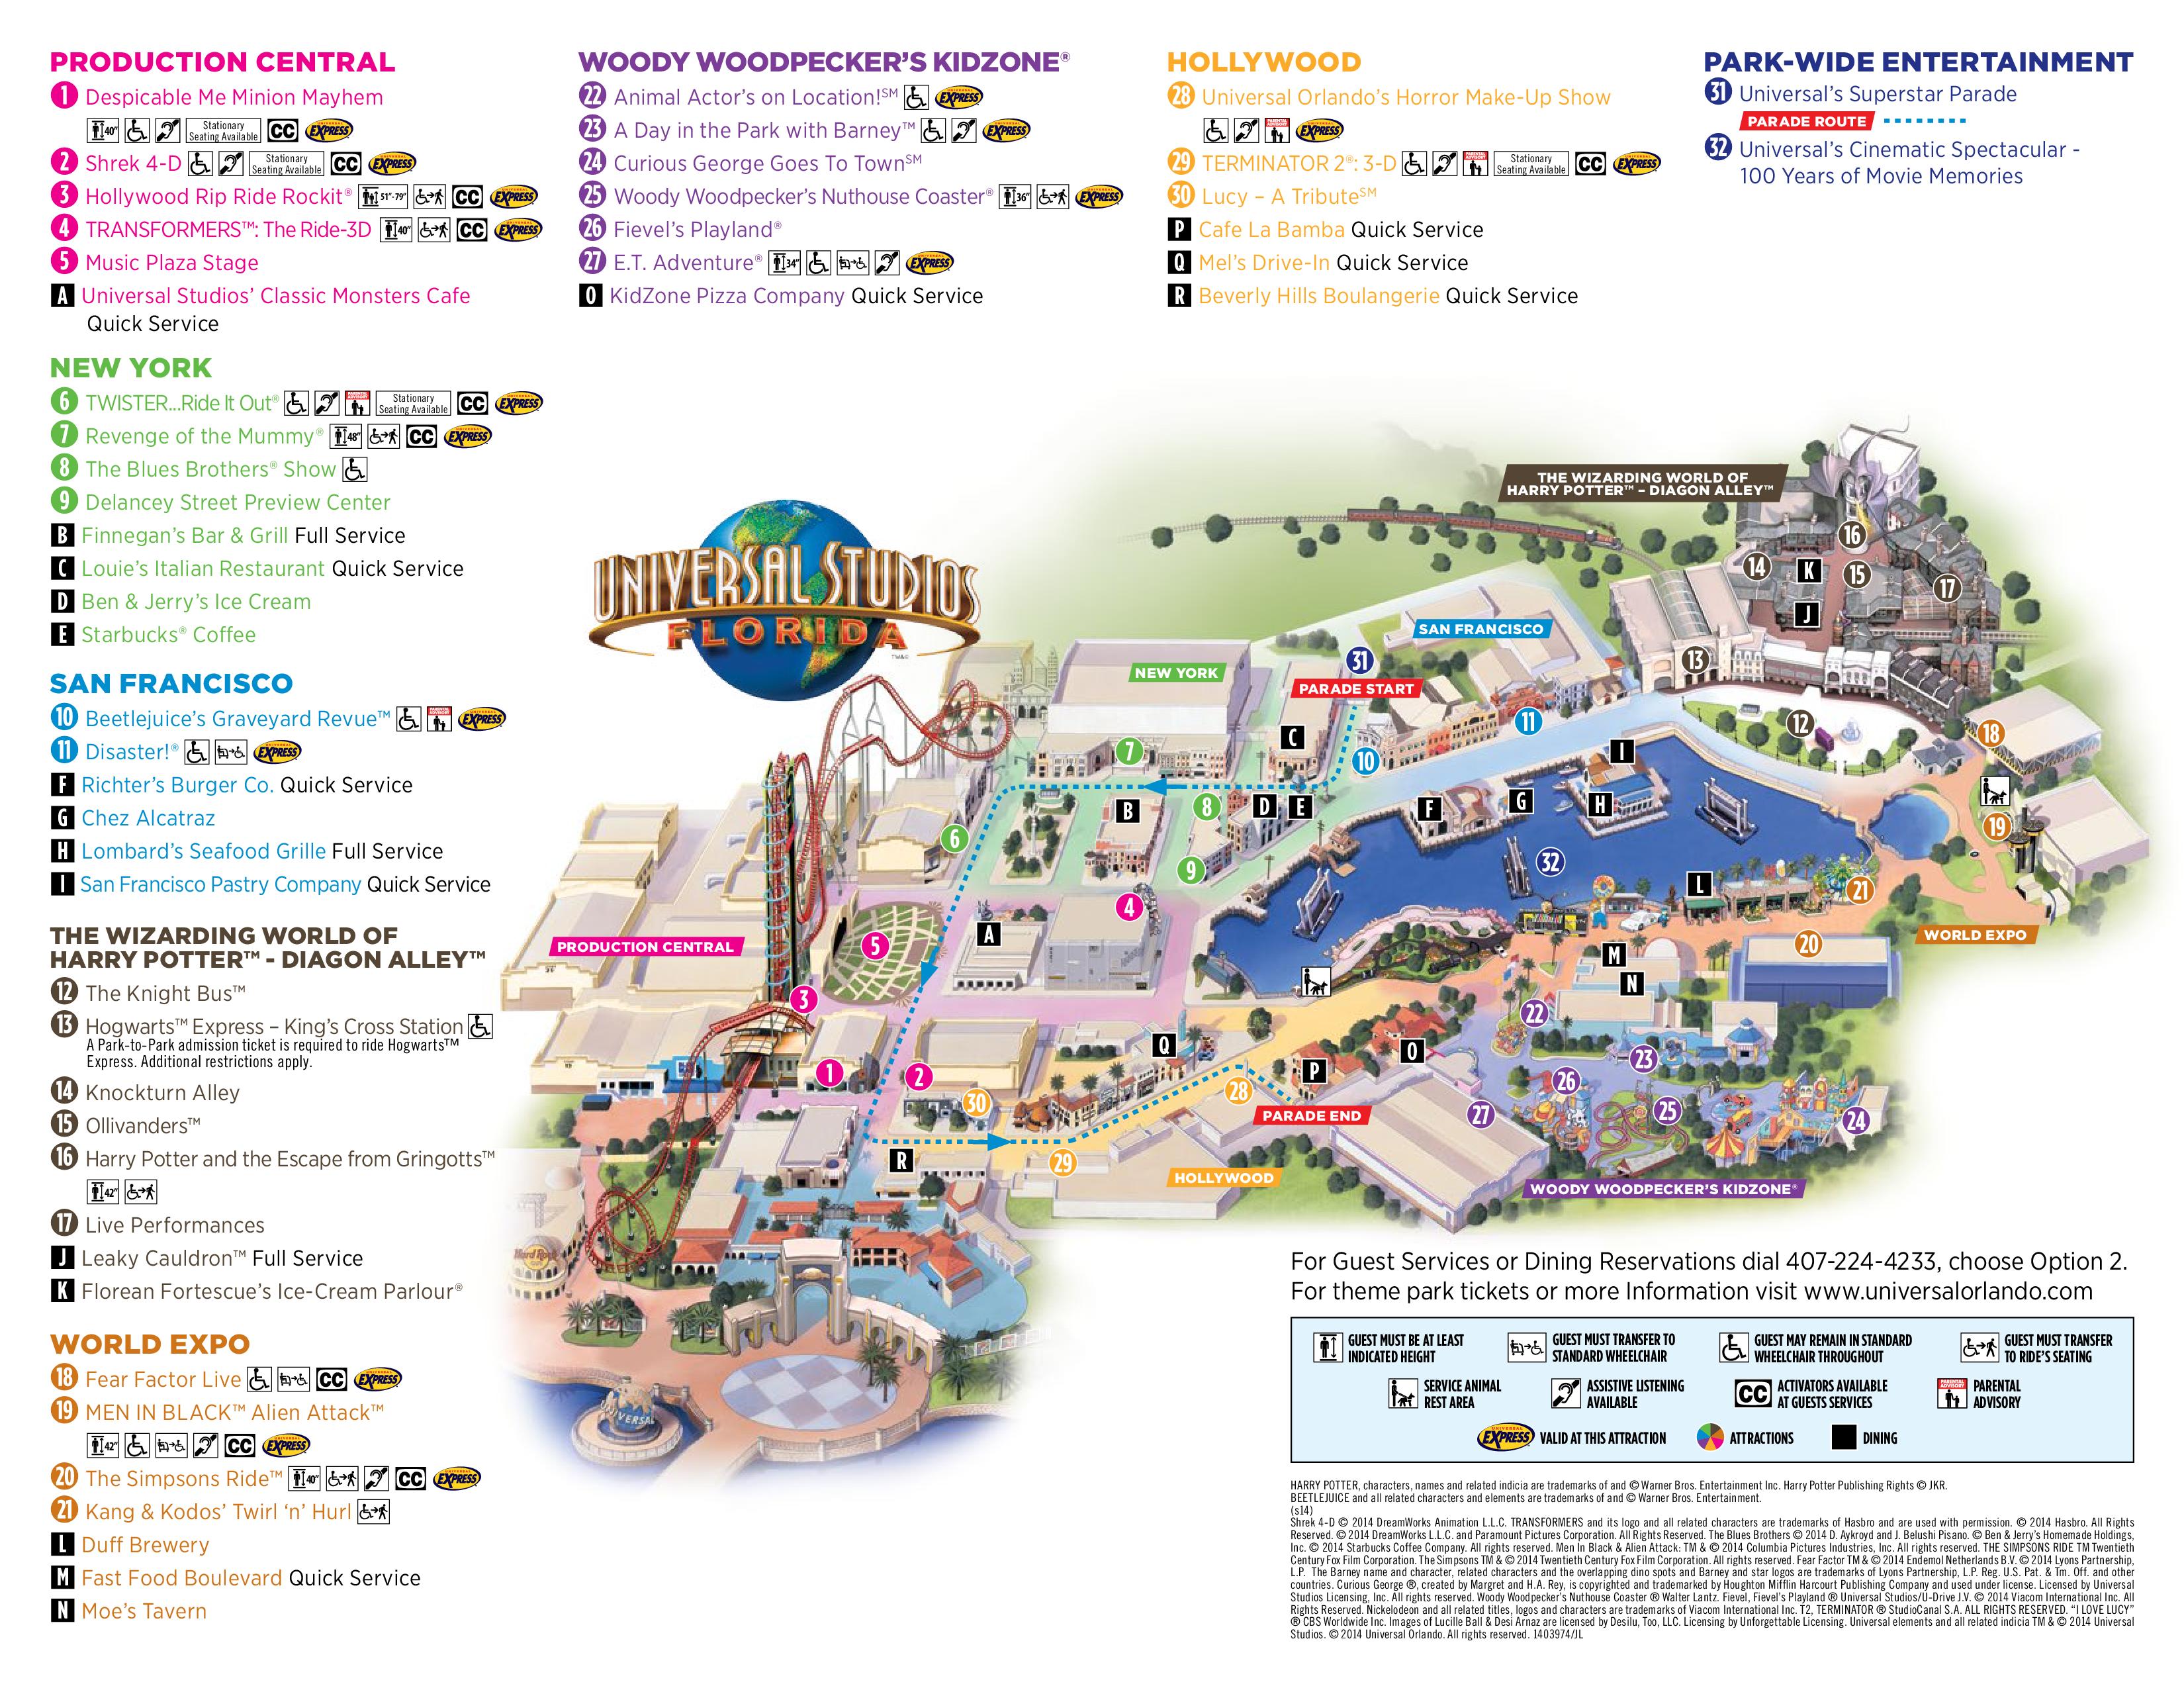 Universal Studios Orlando Map 2015 map of universal studios, orlando florida 2015   1✔️, 2✔️, 3